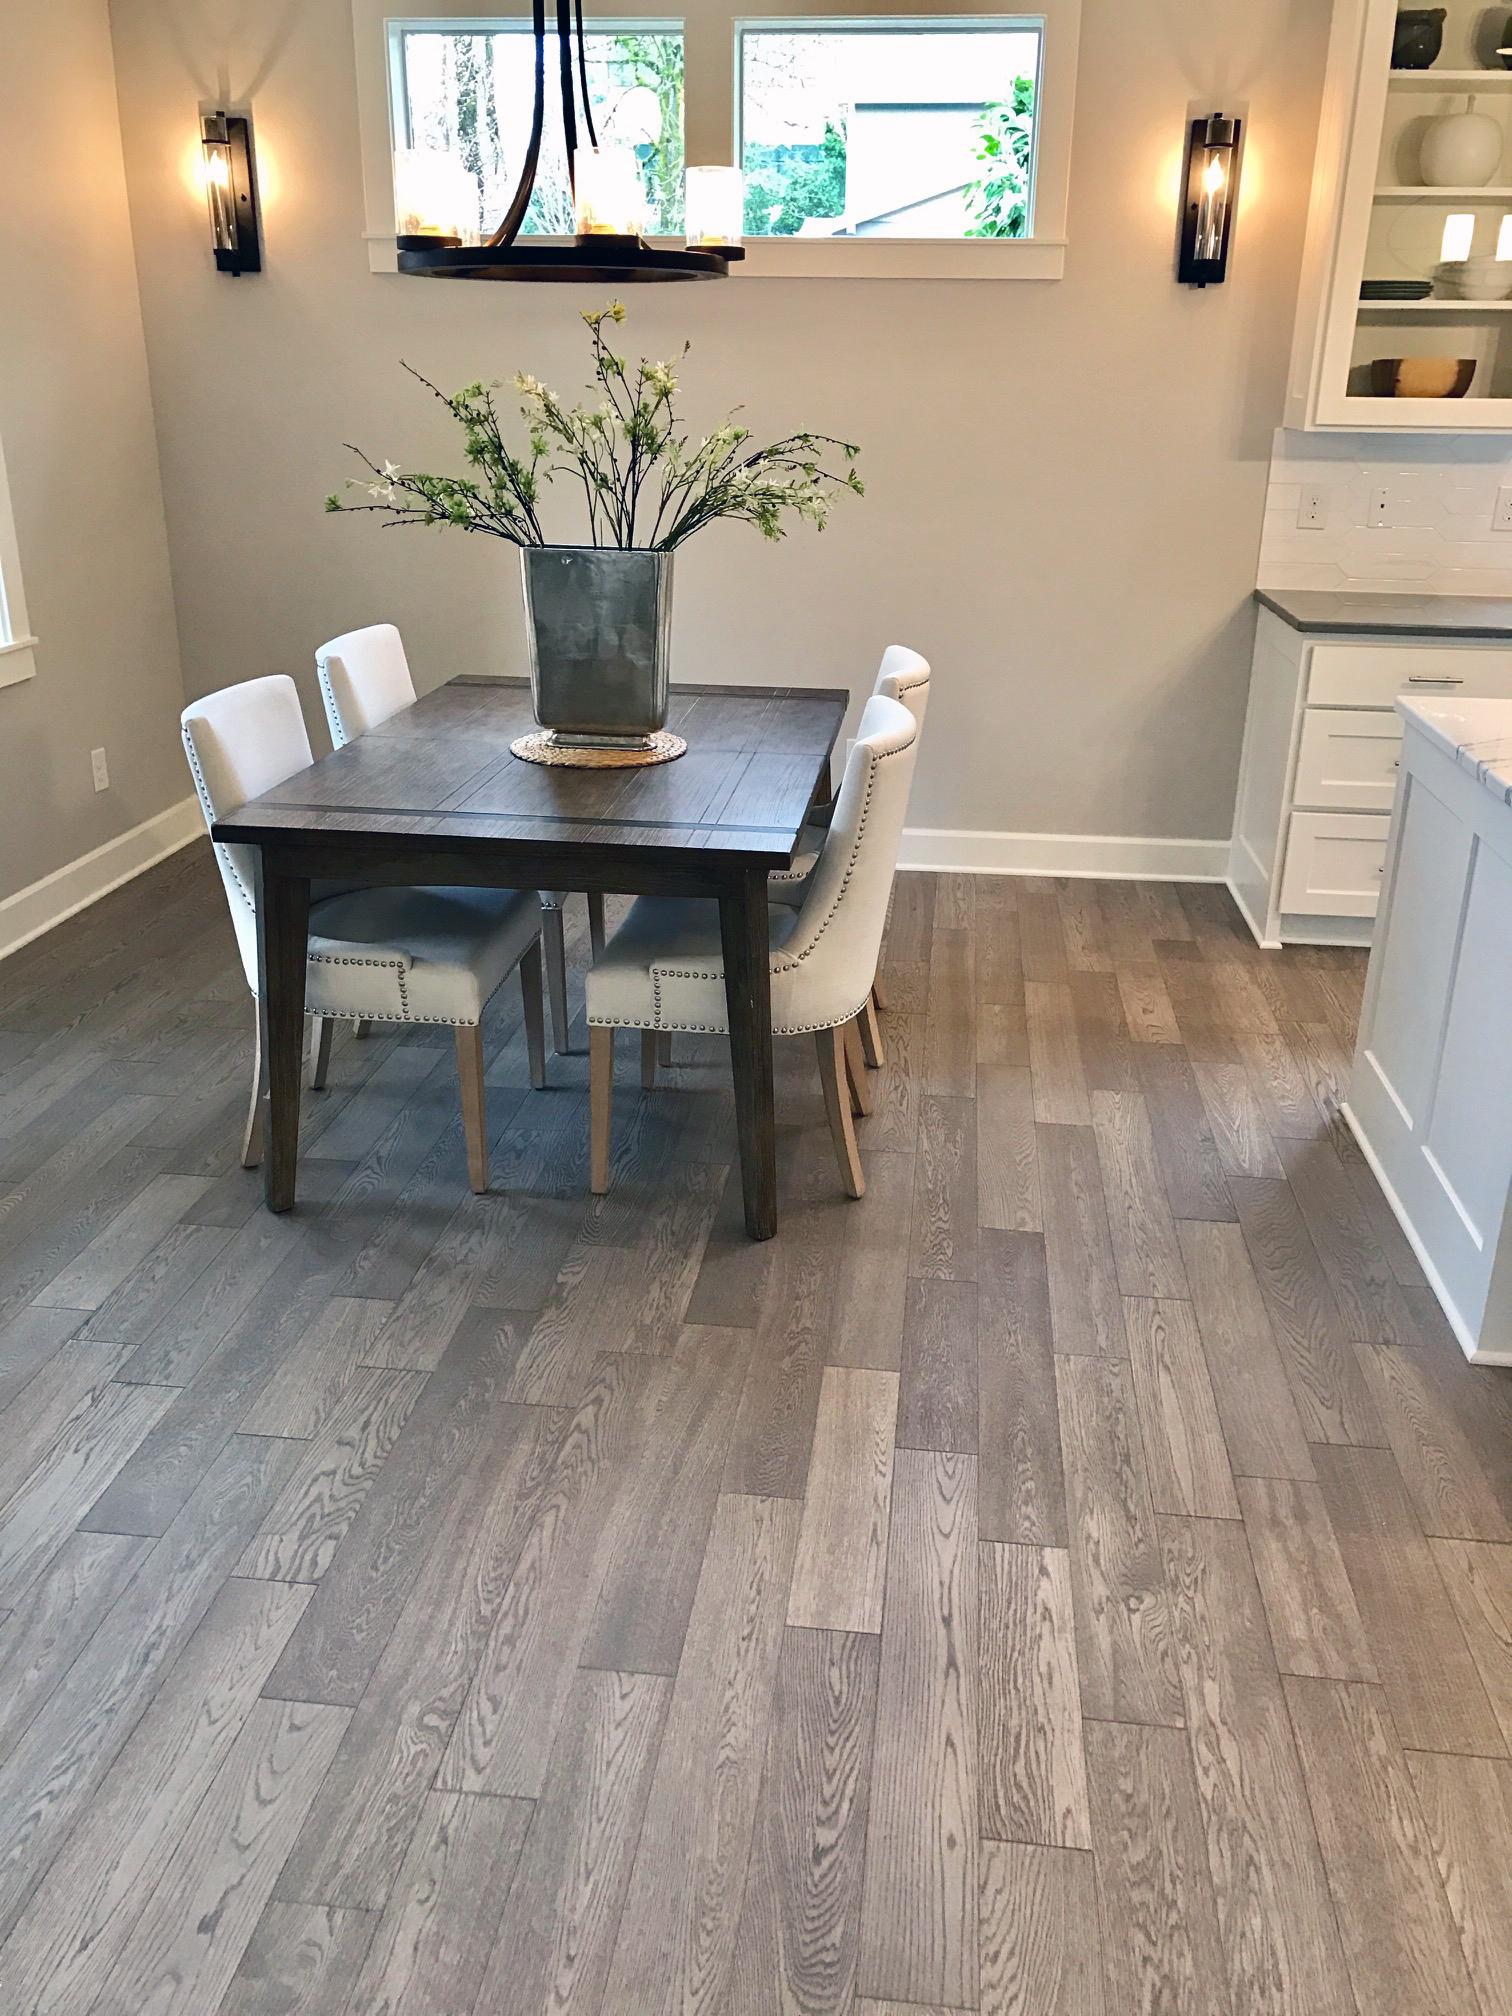 Portland Hardwood Flooring, Countertops and Tile Store